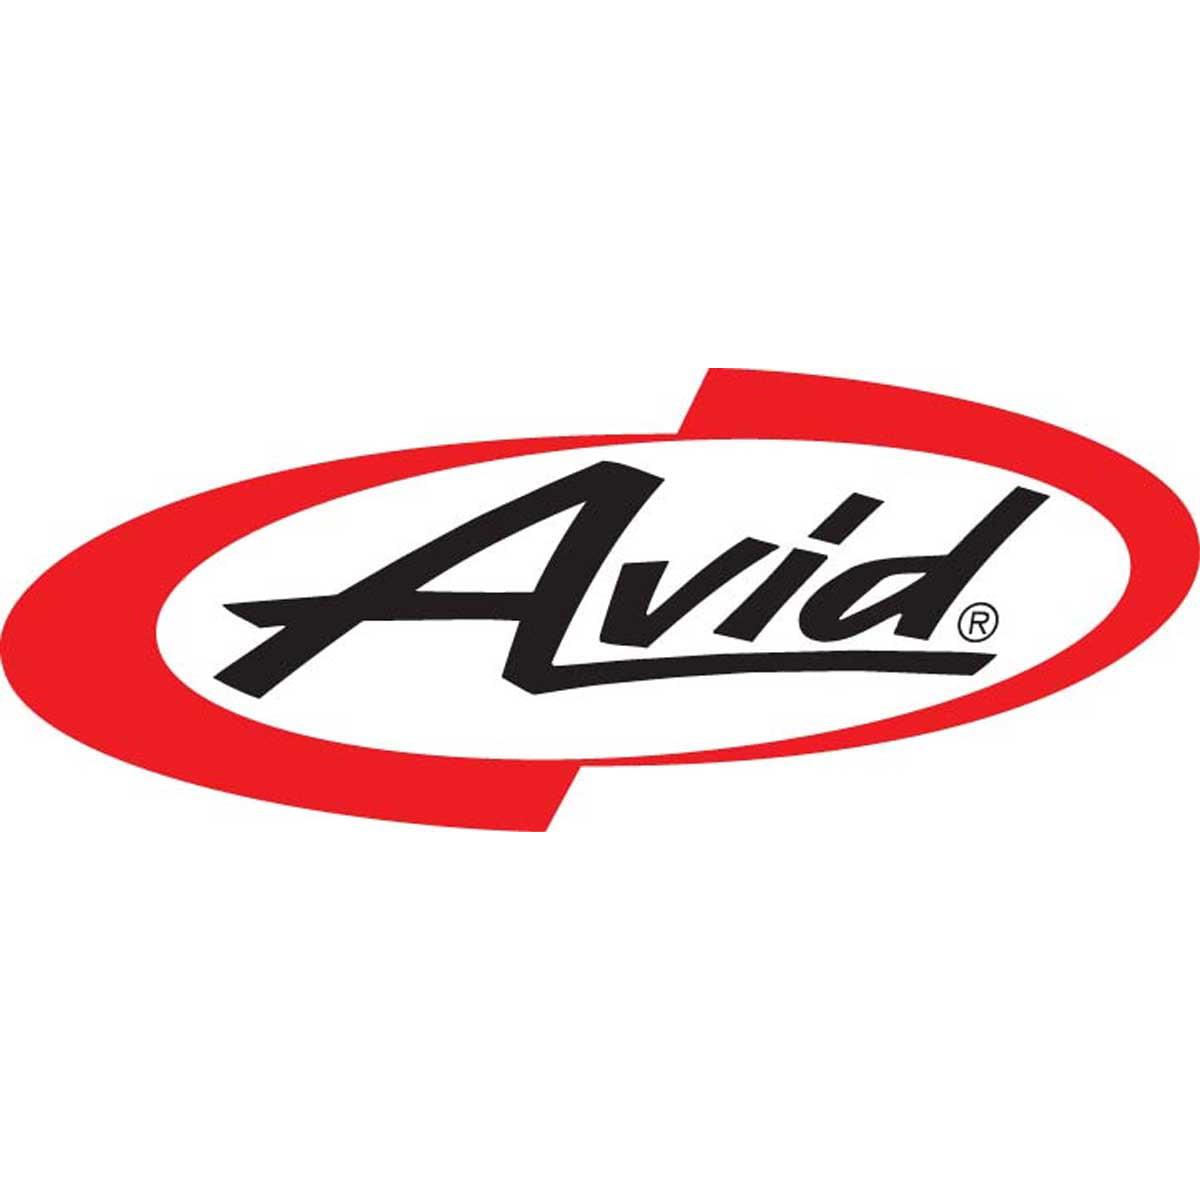 Avid DB1/DB3 Bicycle Brake Lever Internals - 11.5018.005.002